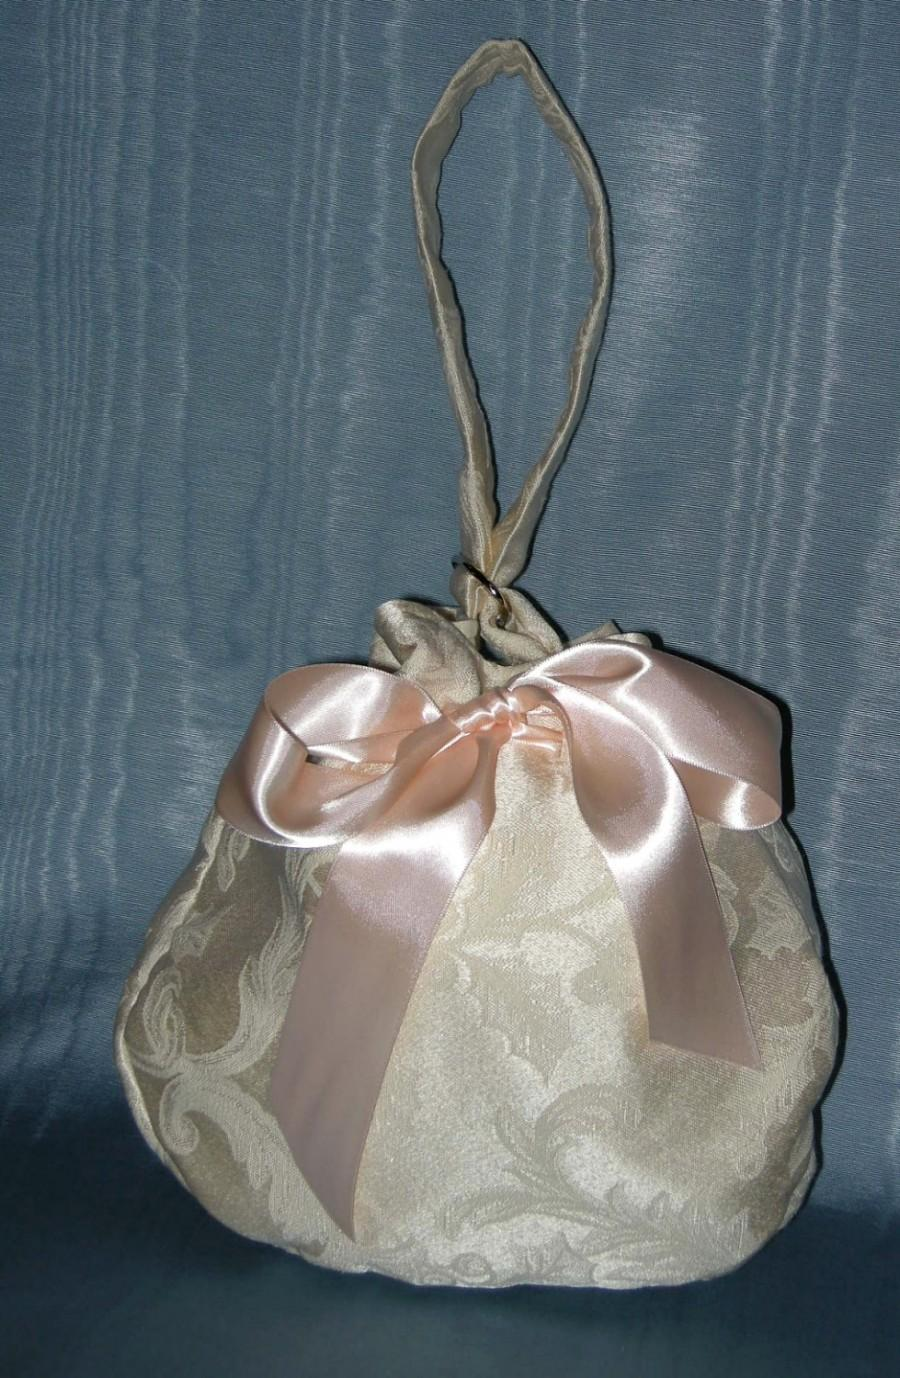 زفاف - Wedding Dollar Dance Bag Purse Ivory Satin Brocade with Satin Ribbon Drawstring and Wrist Strap, Lined with Moire Polished Cotton